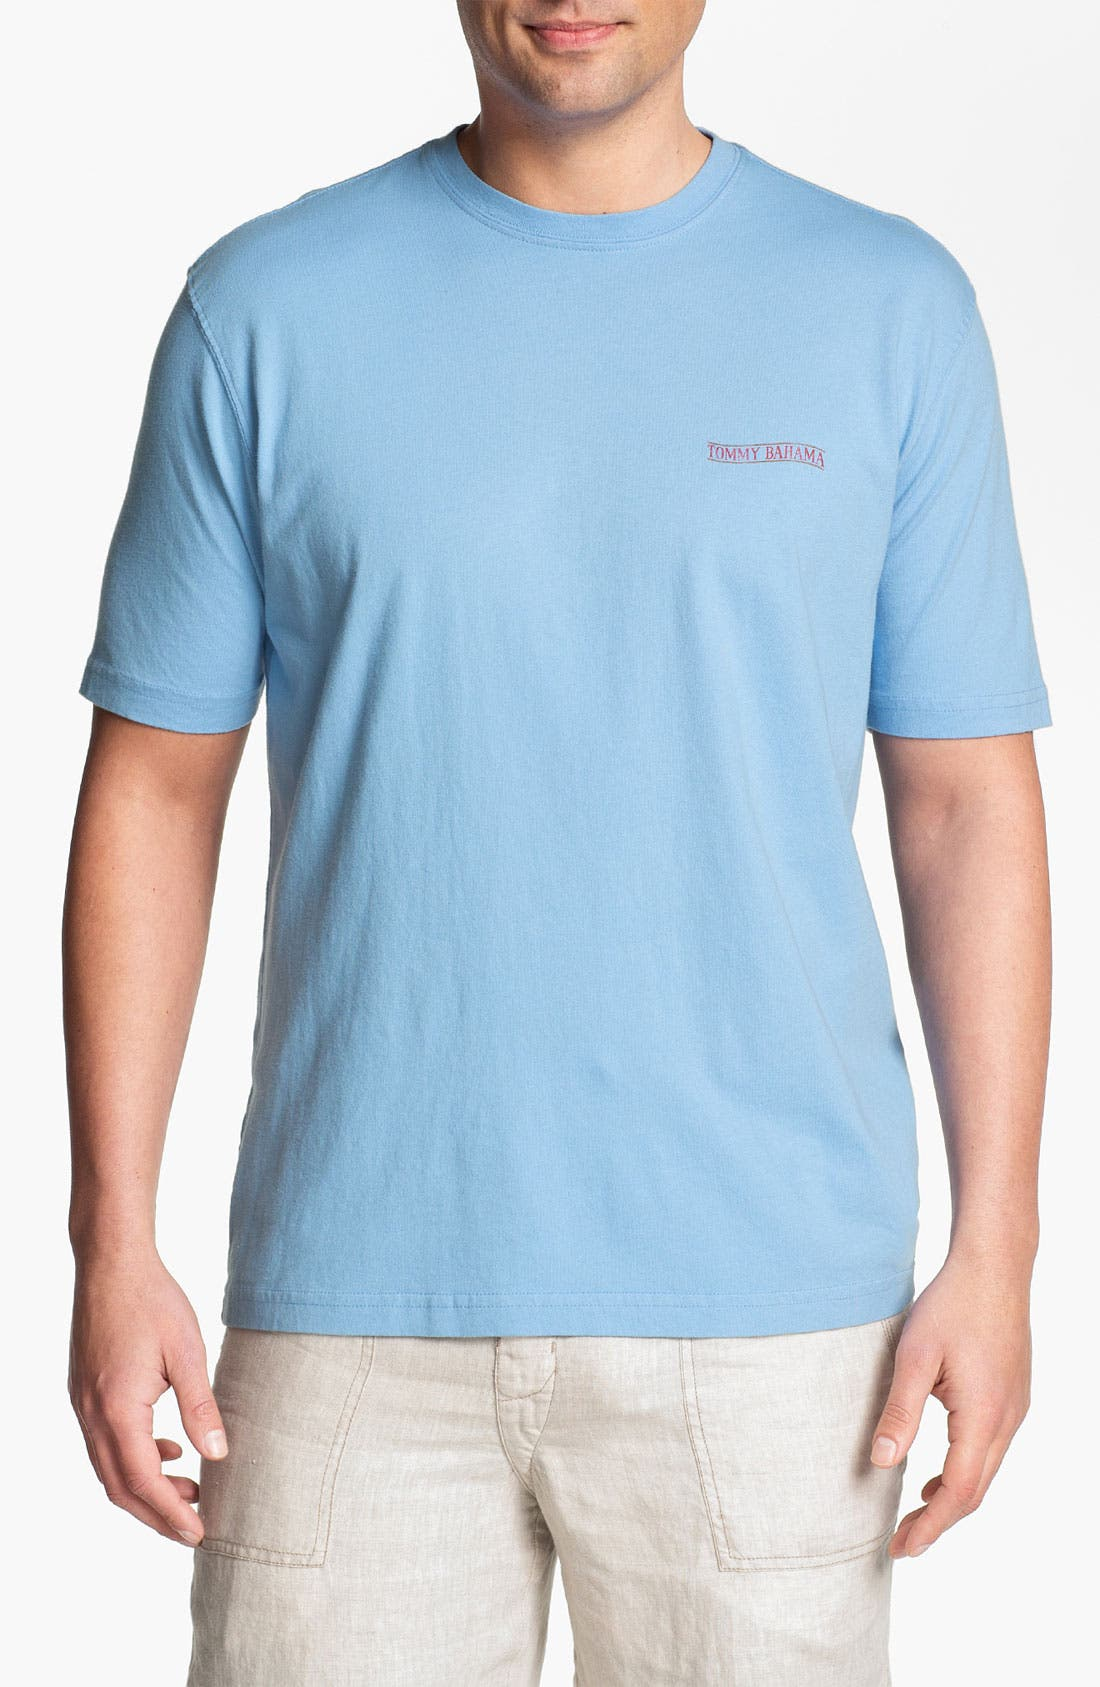 Alternate Image 1 Selected - Tommy Bahama 'Open Bottle, Open Mind' T-Shirt